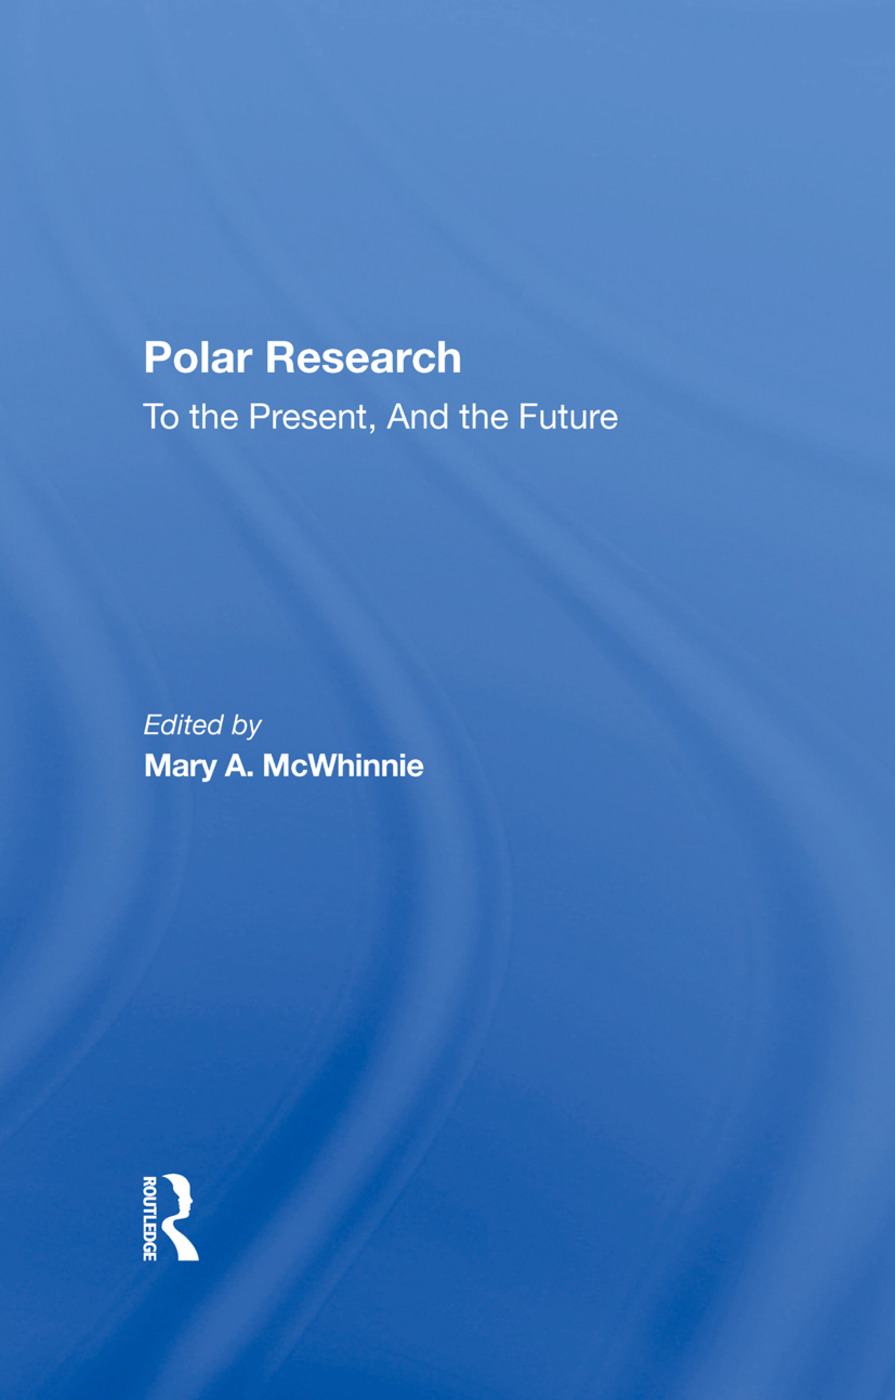 Major International Polar Research Programs